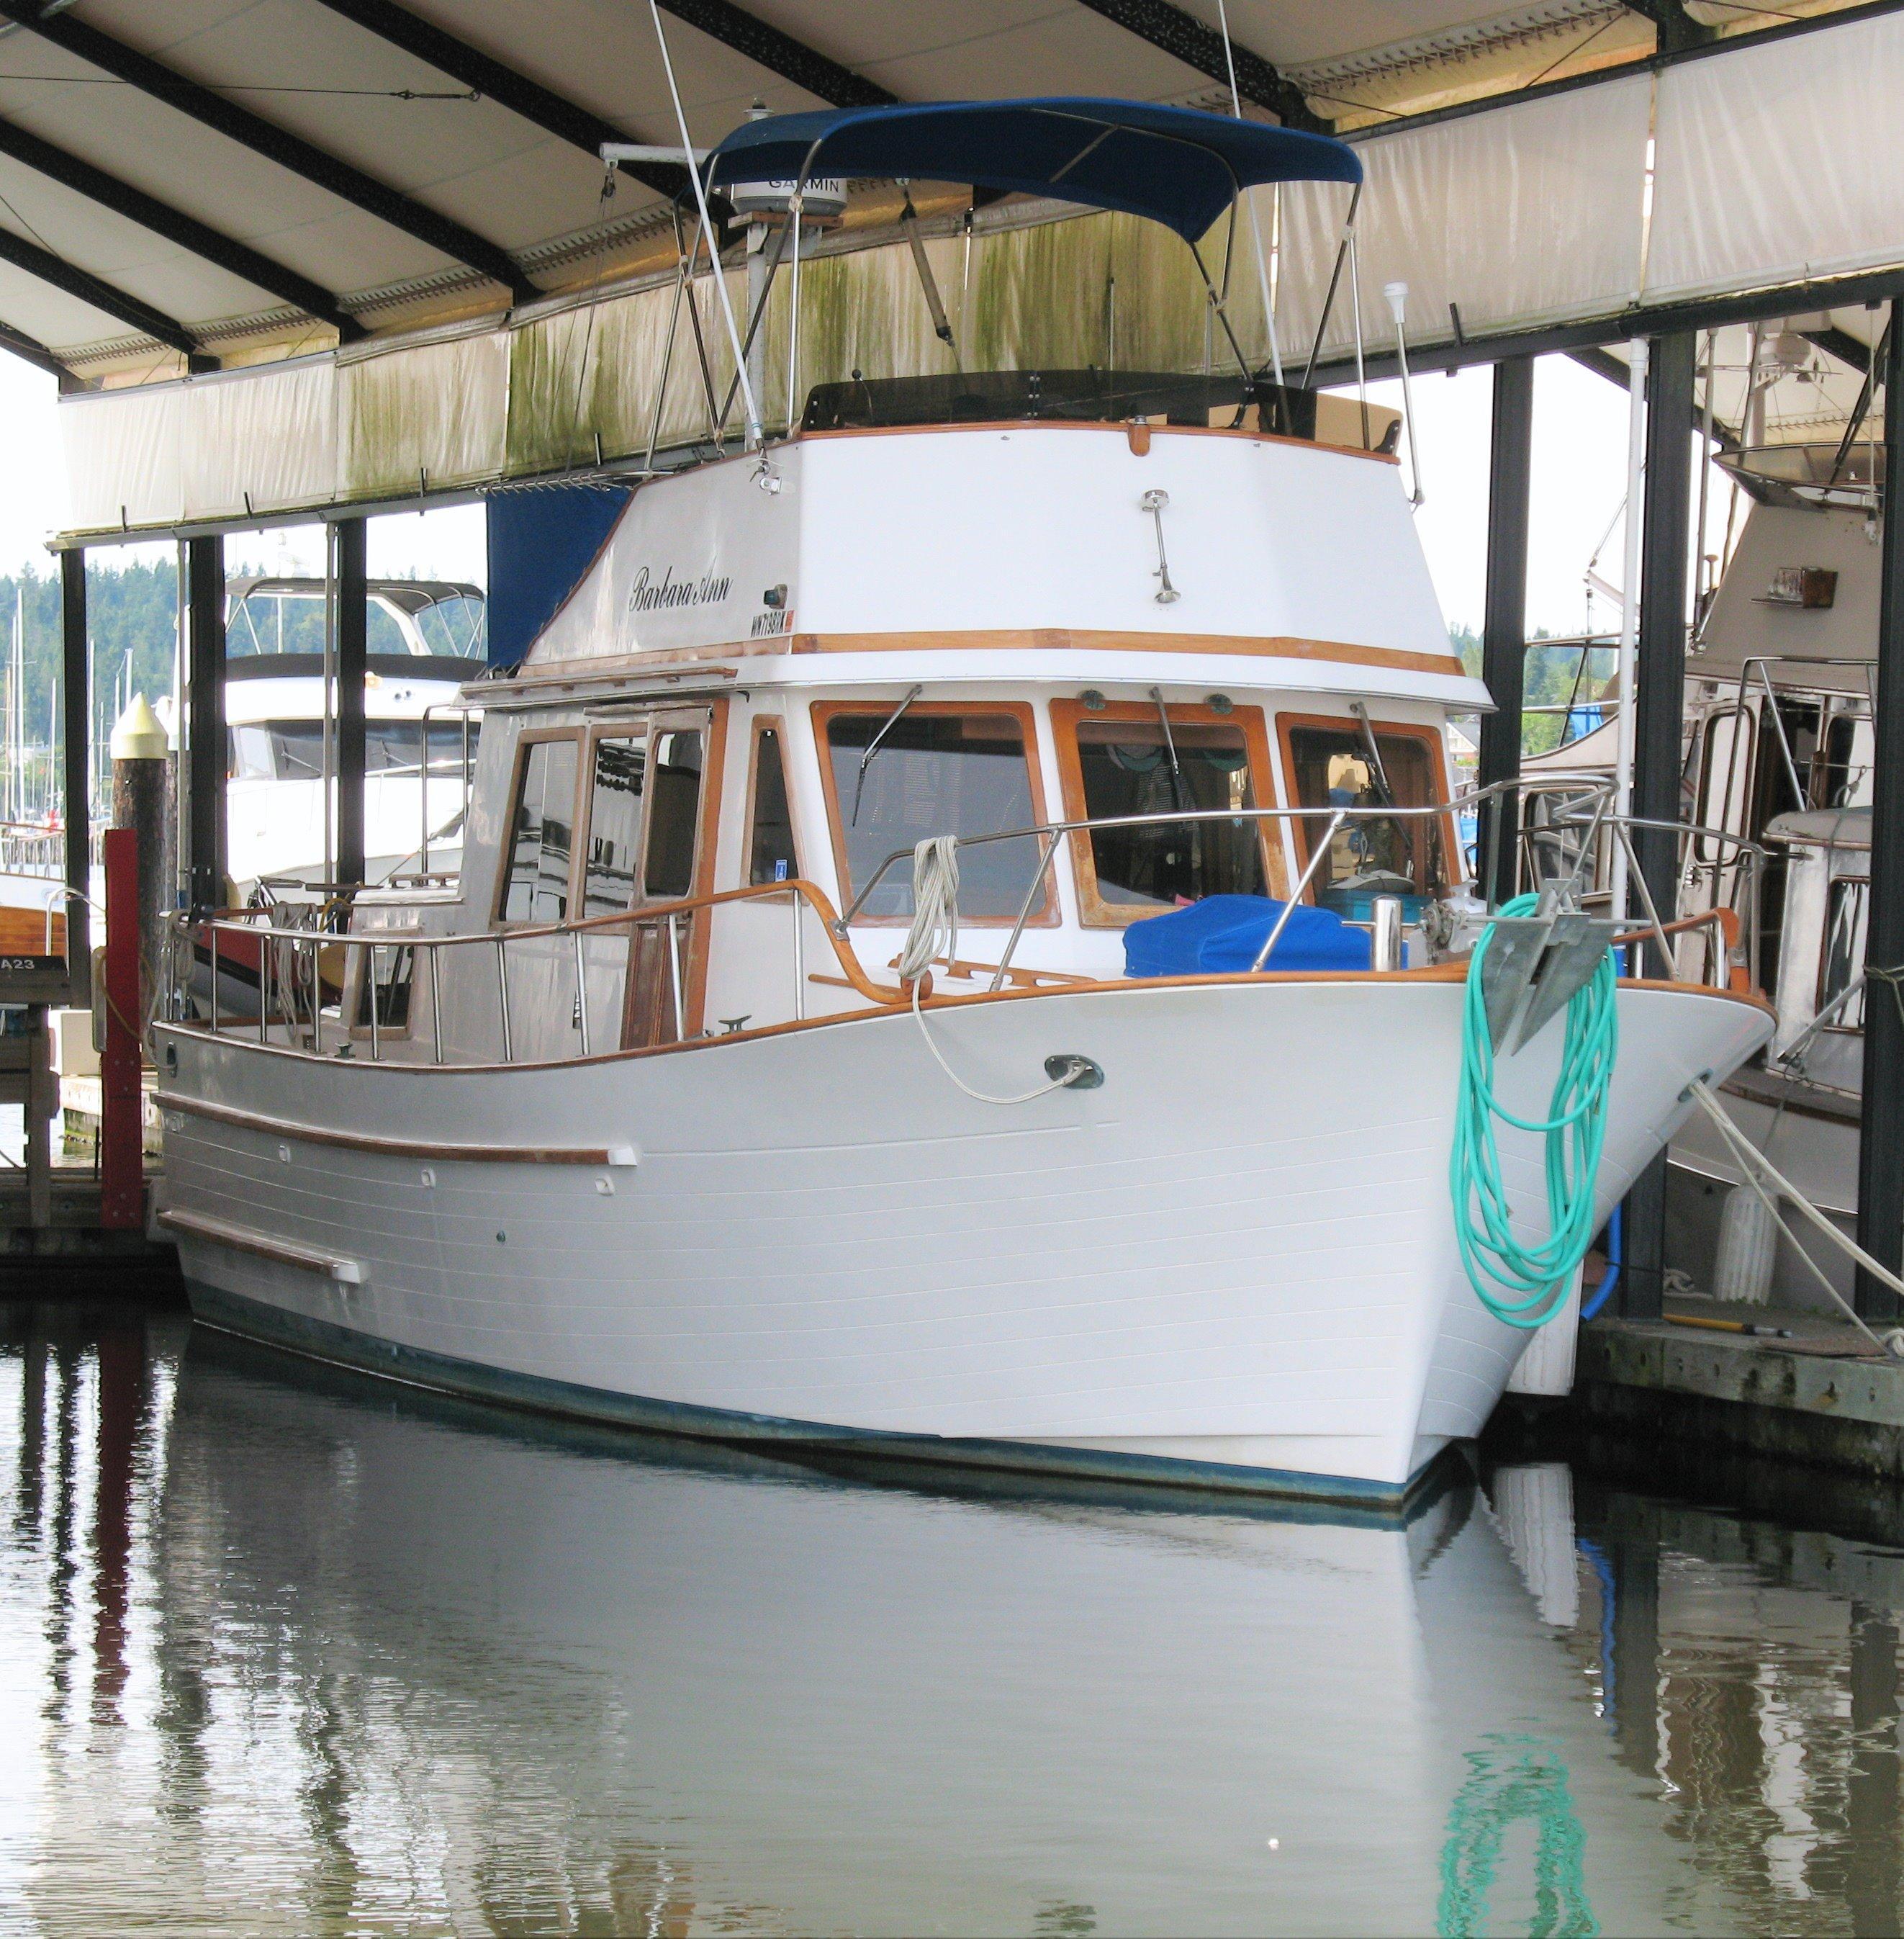 35 ft 1981 chb tri-cabin trawler